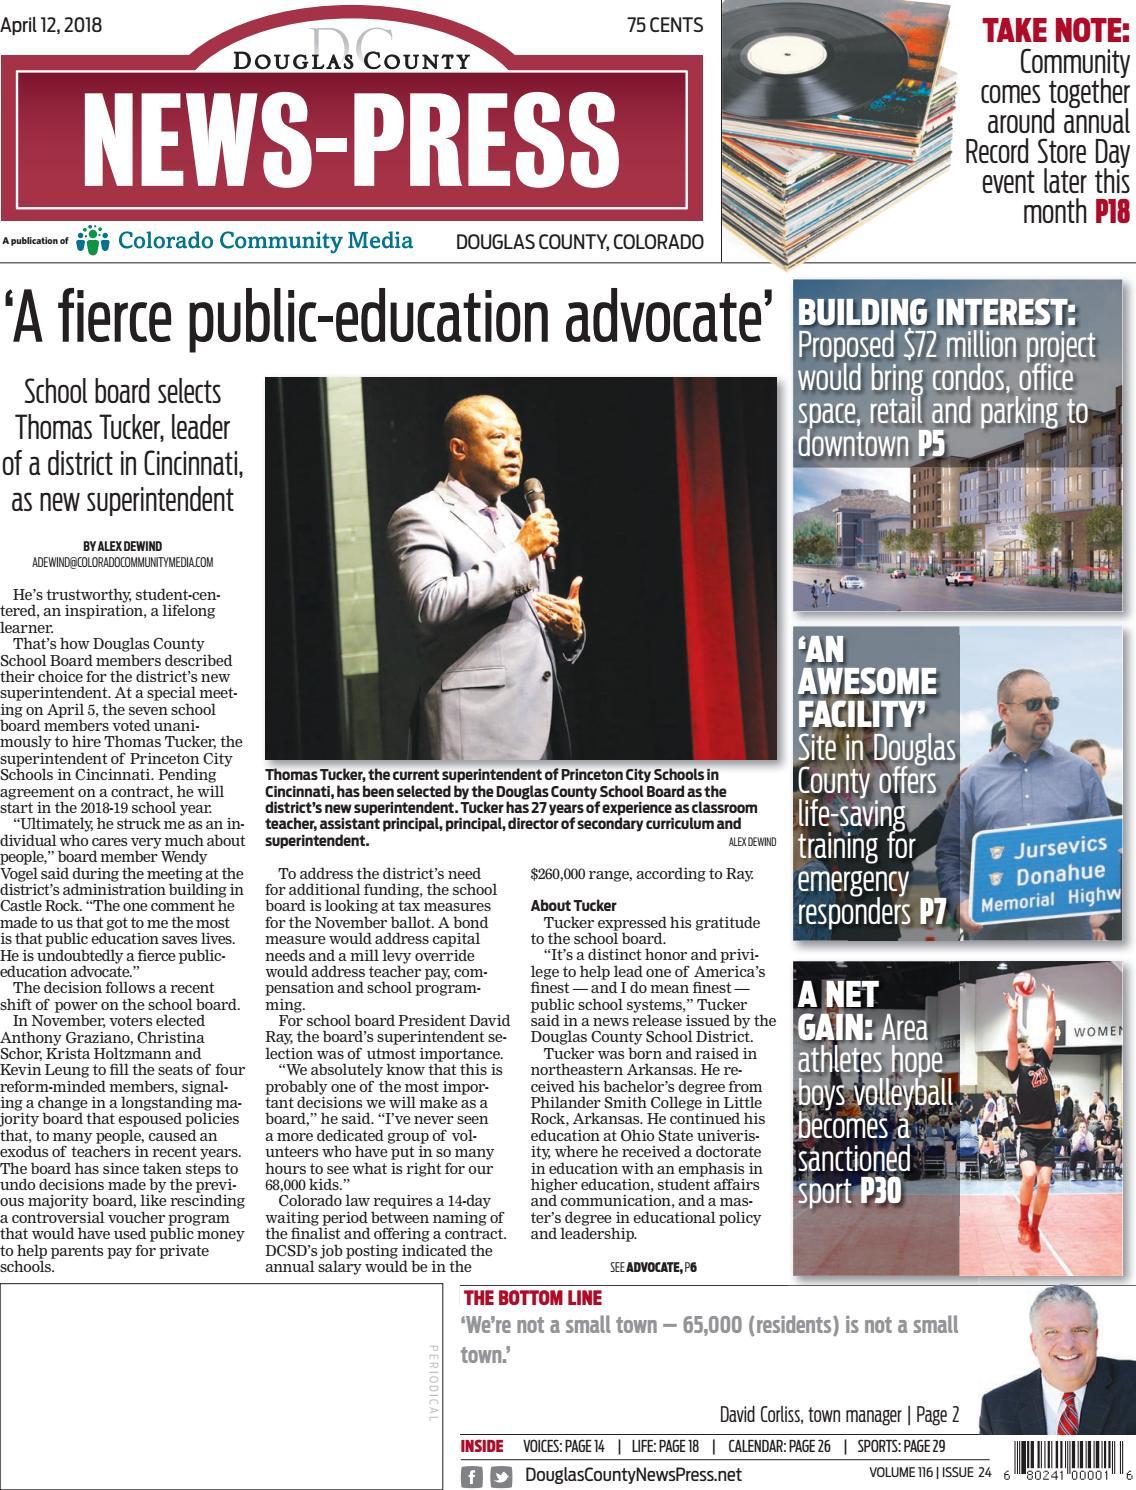 Douglas County News Press 0412 by Colorado Community Media - issuu